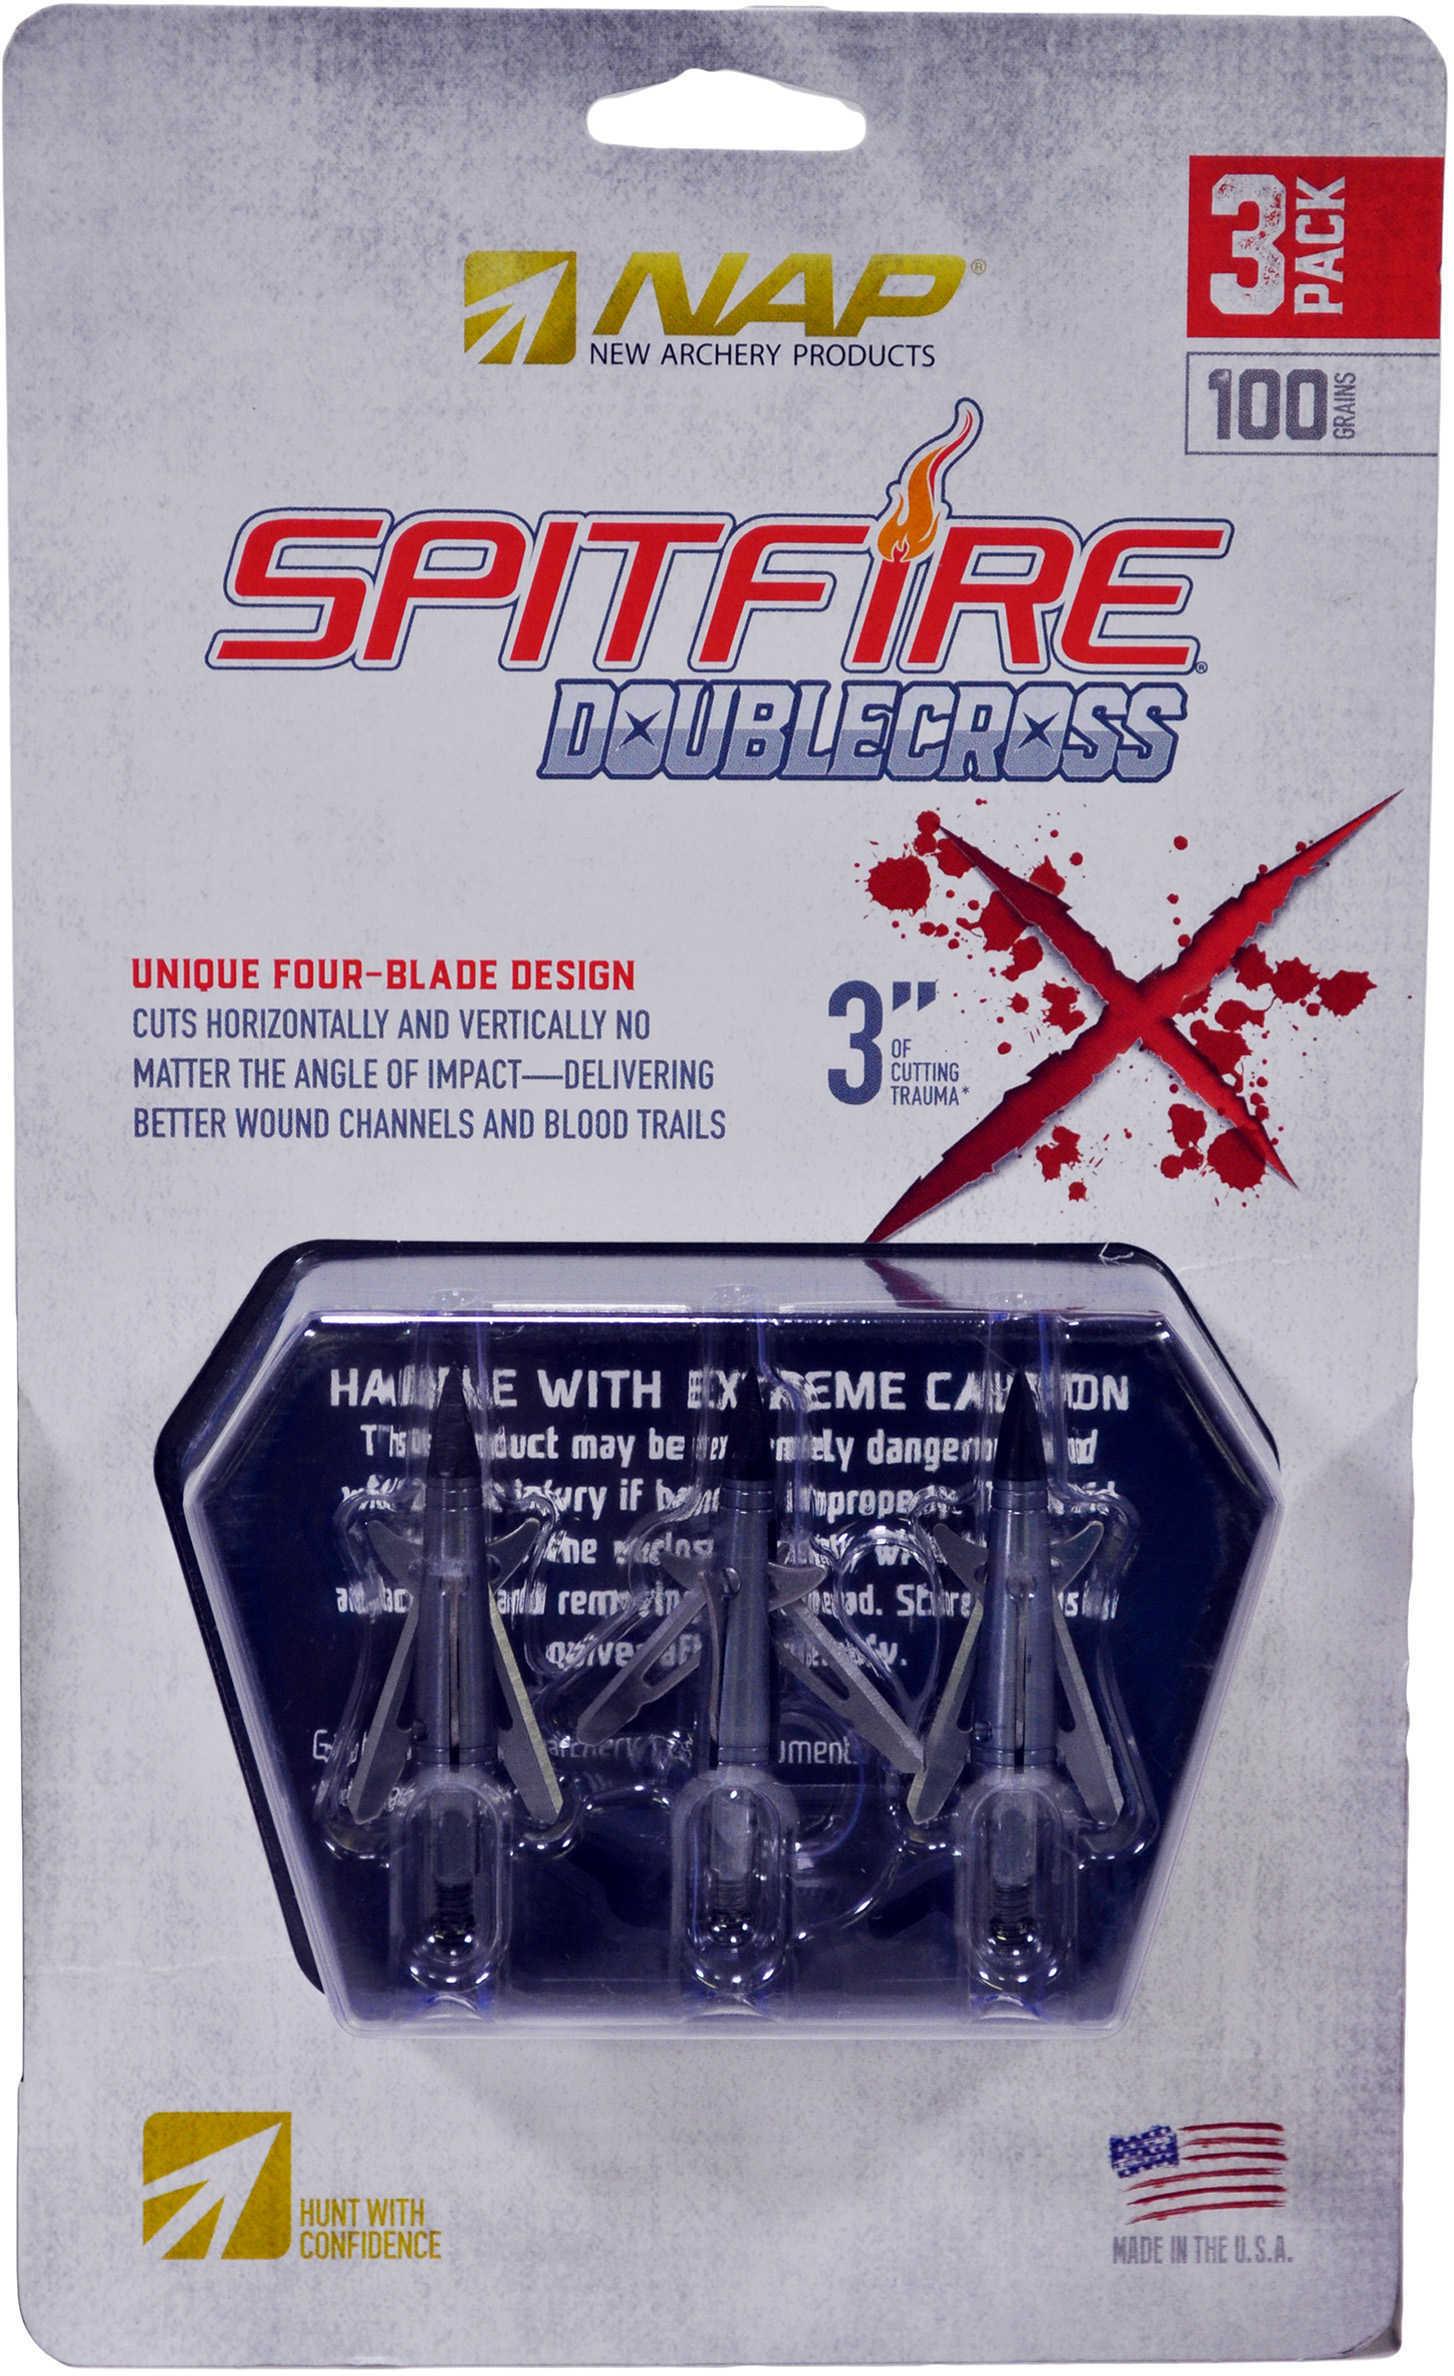 New Archery Broadheads Spitfire Double Cross 100 Grains 3 Pack Model: 60-086